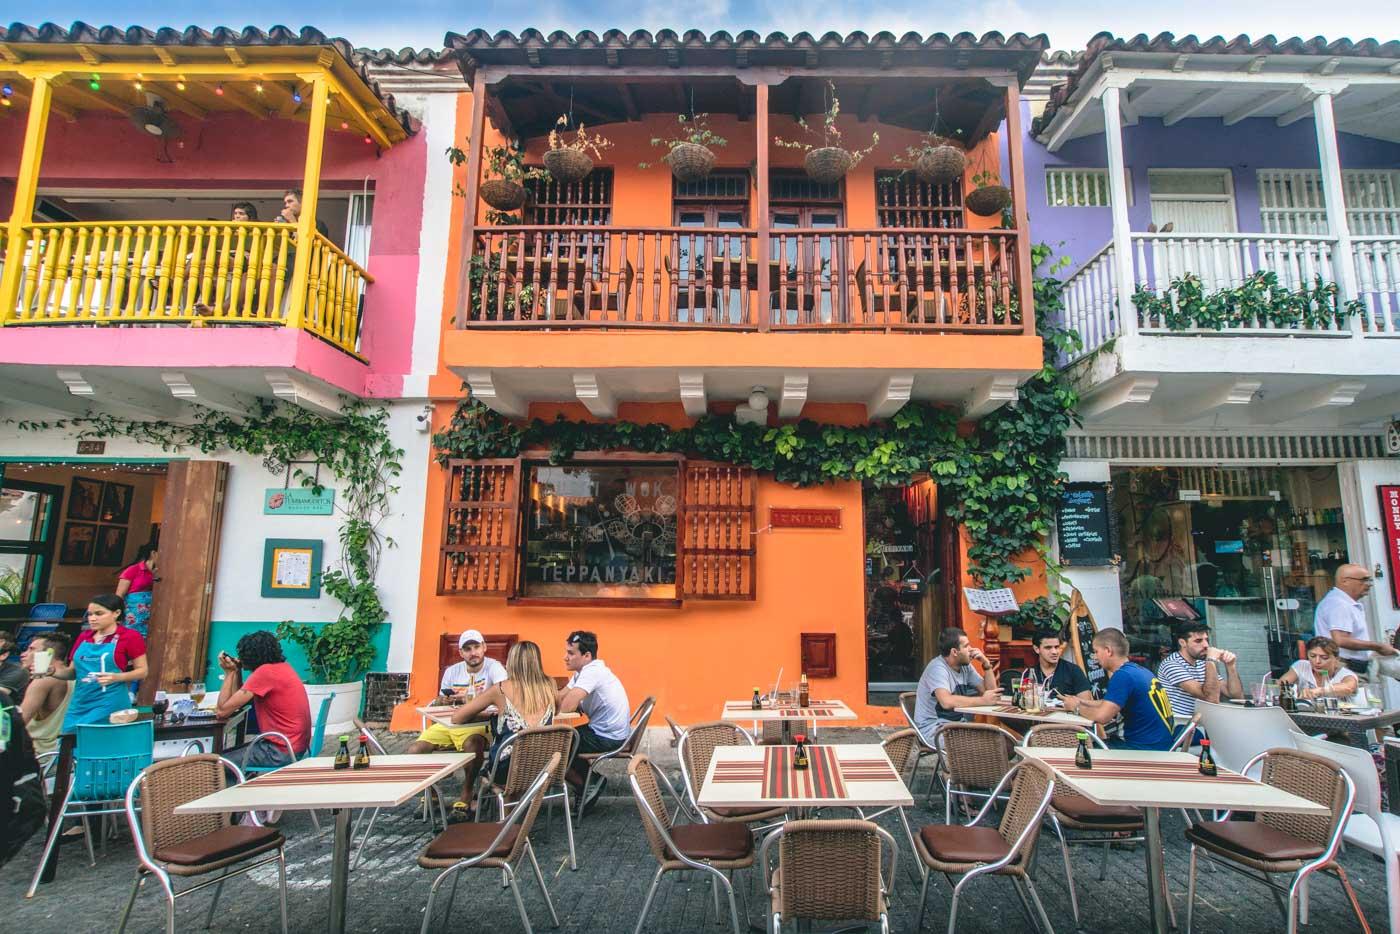 Vibrant outdoor restaurant in Cartagena, Colombia